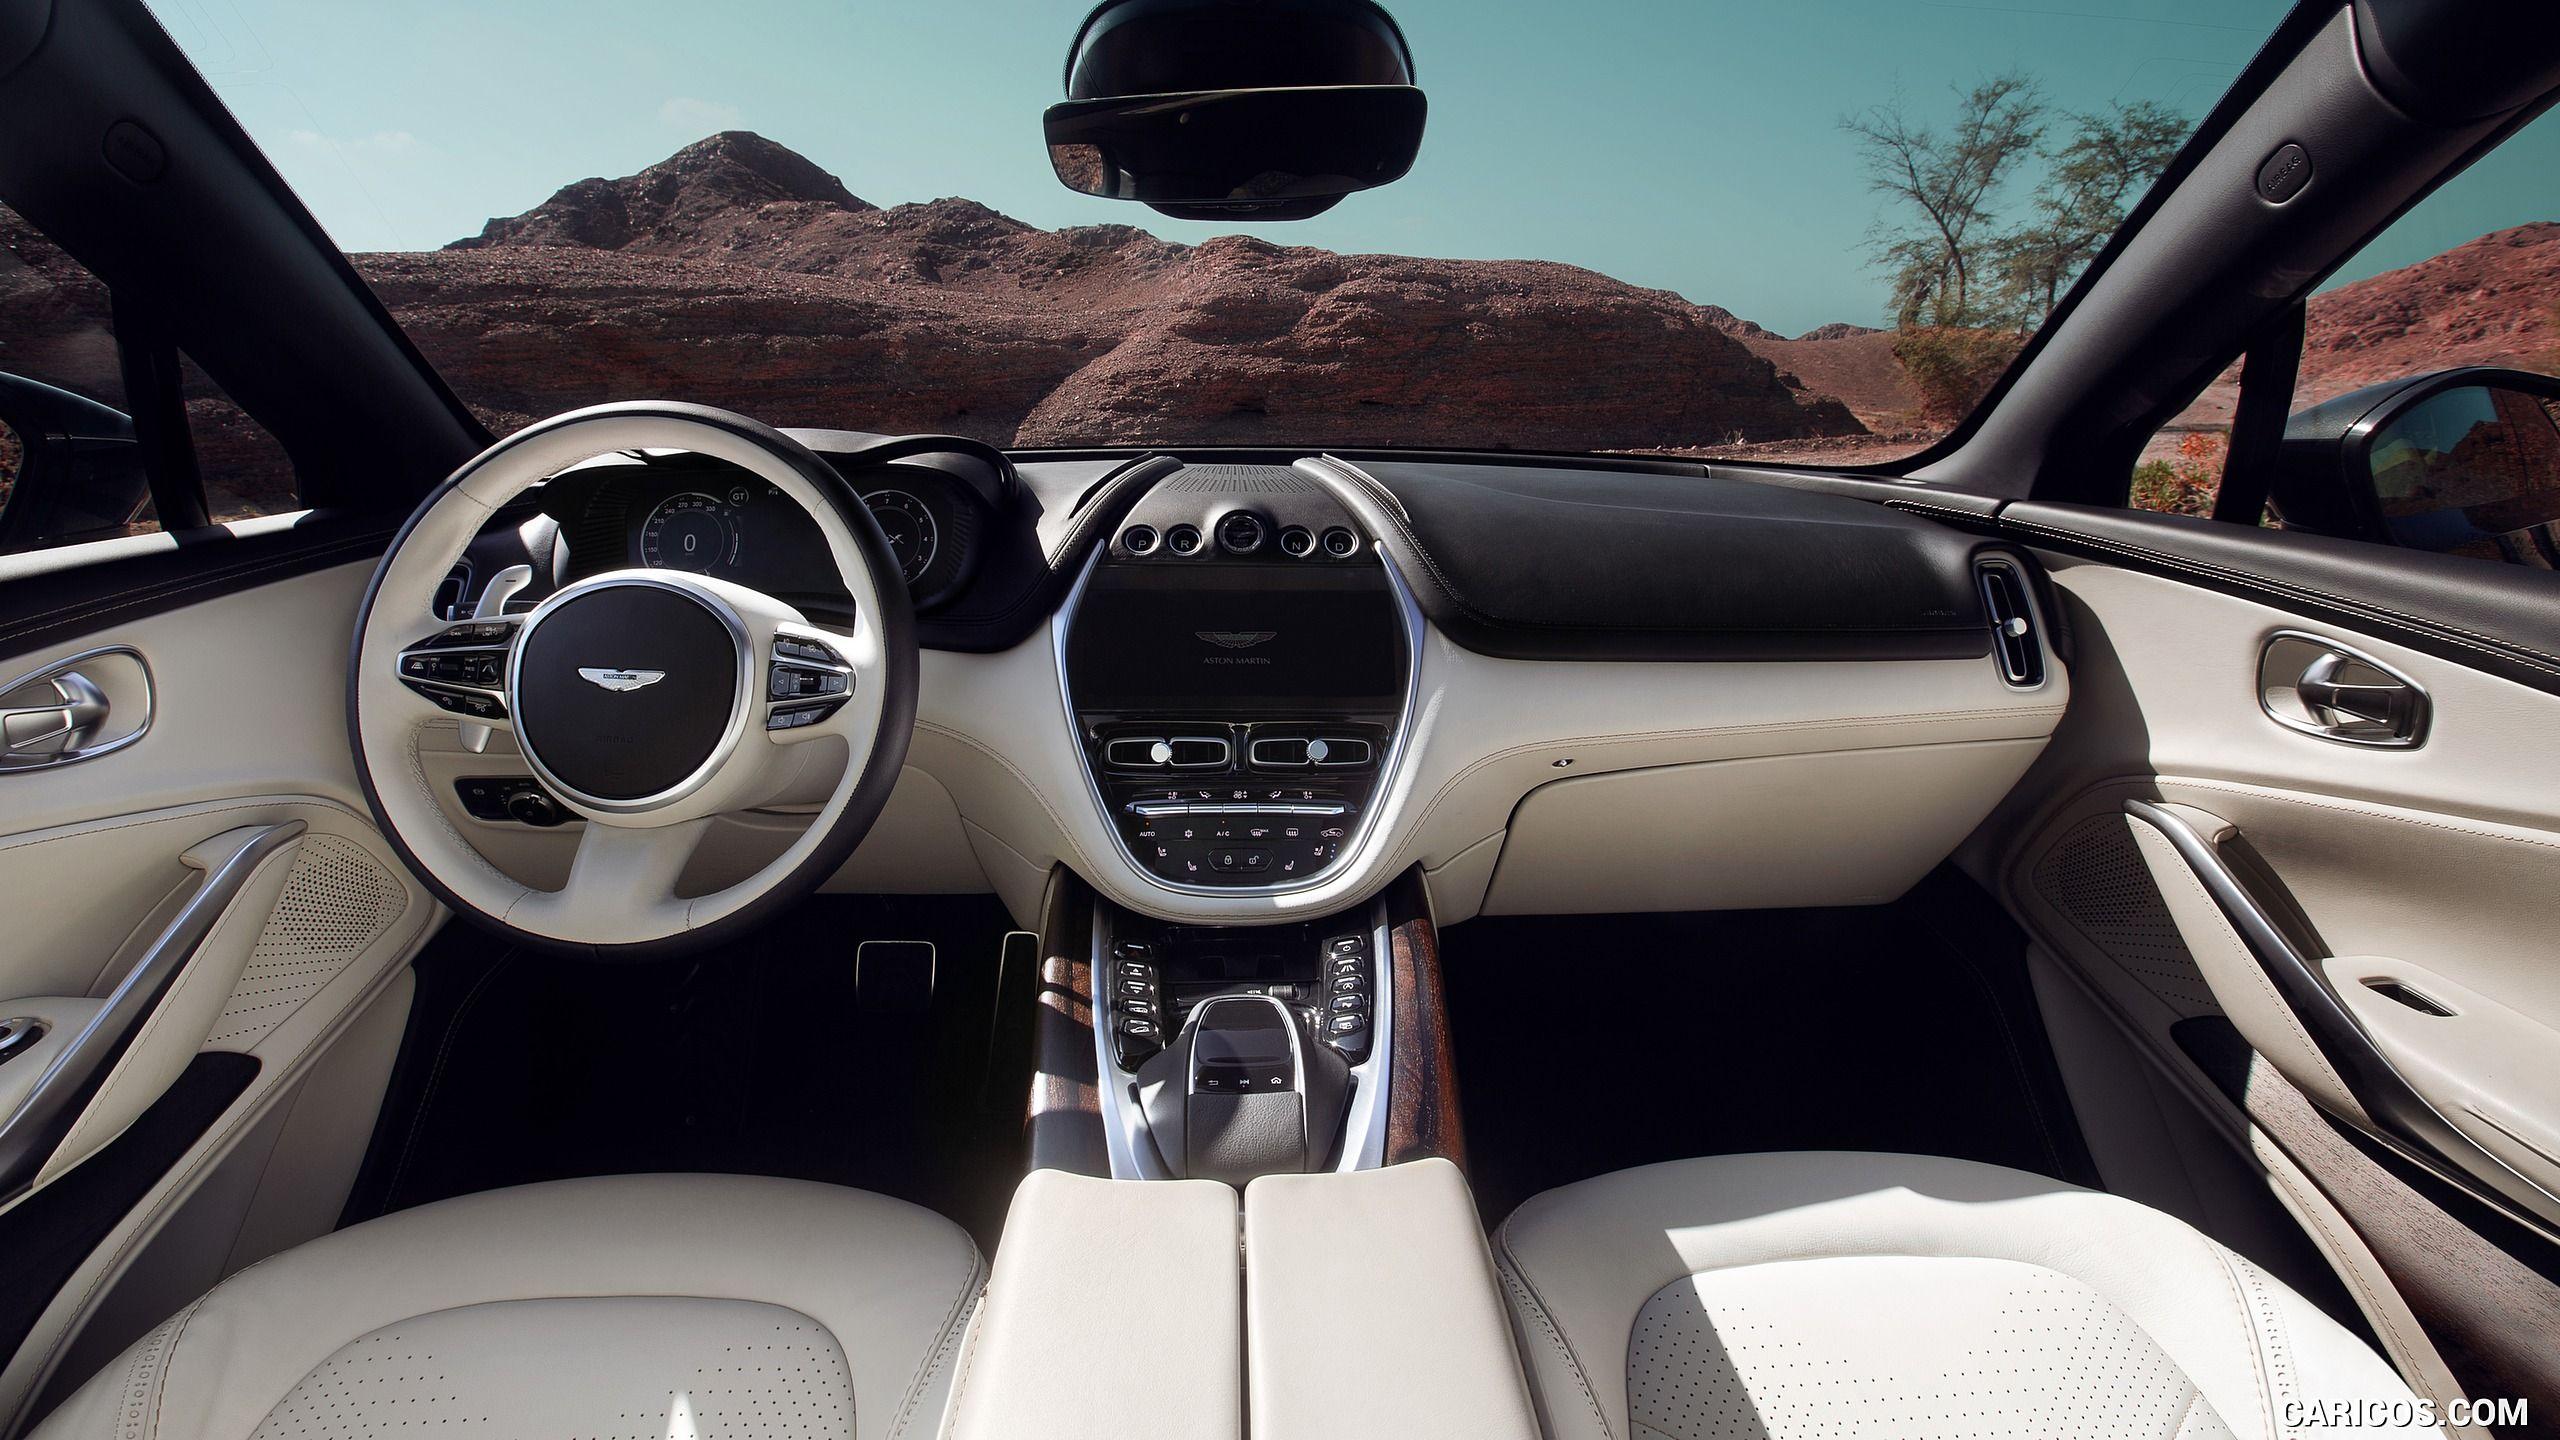 2021 Aston Martin Dbx Interior Cockpit Hd Aston Martin Aston Martin Interior Aston